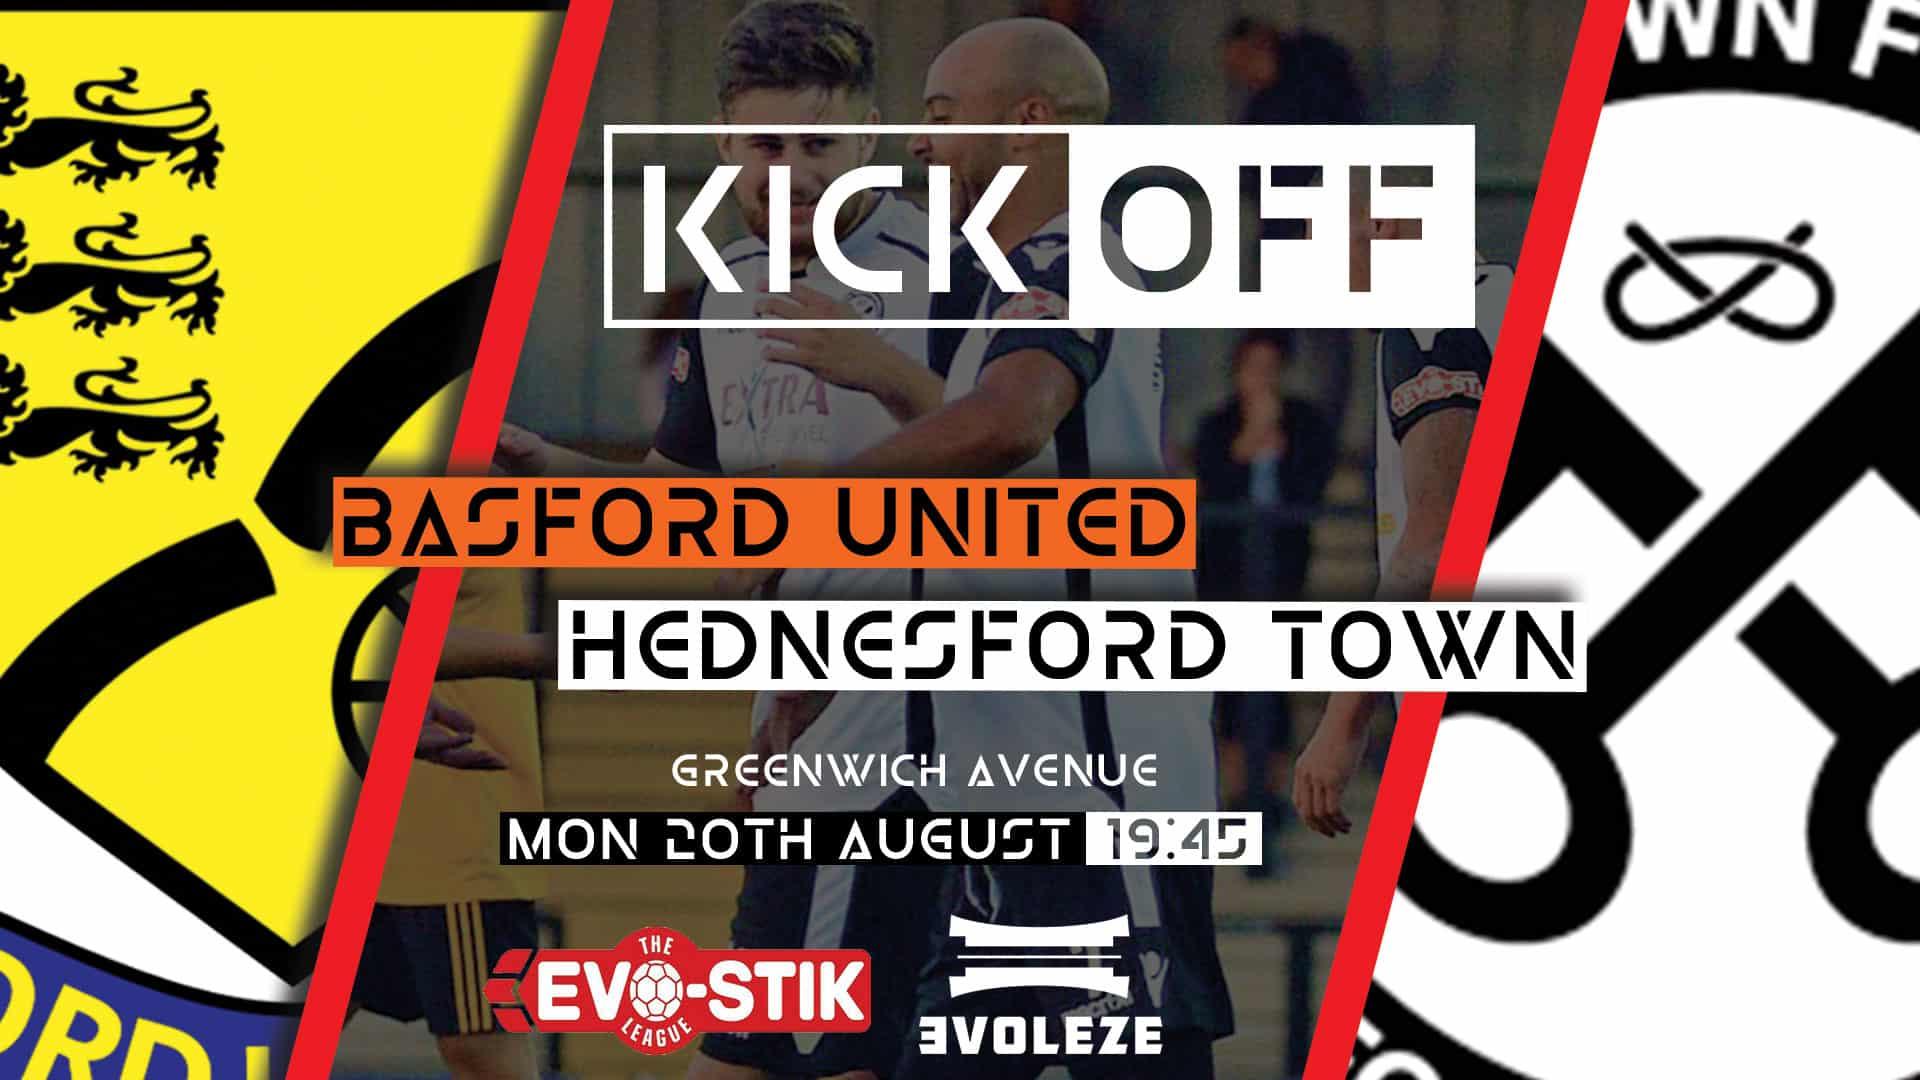 kick off Hednesford Town FC